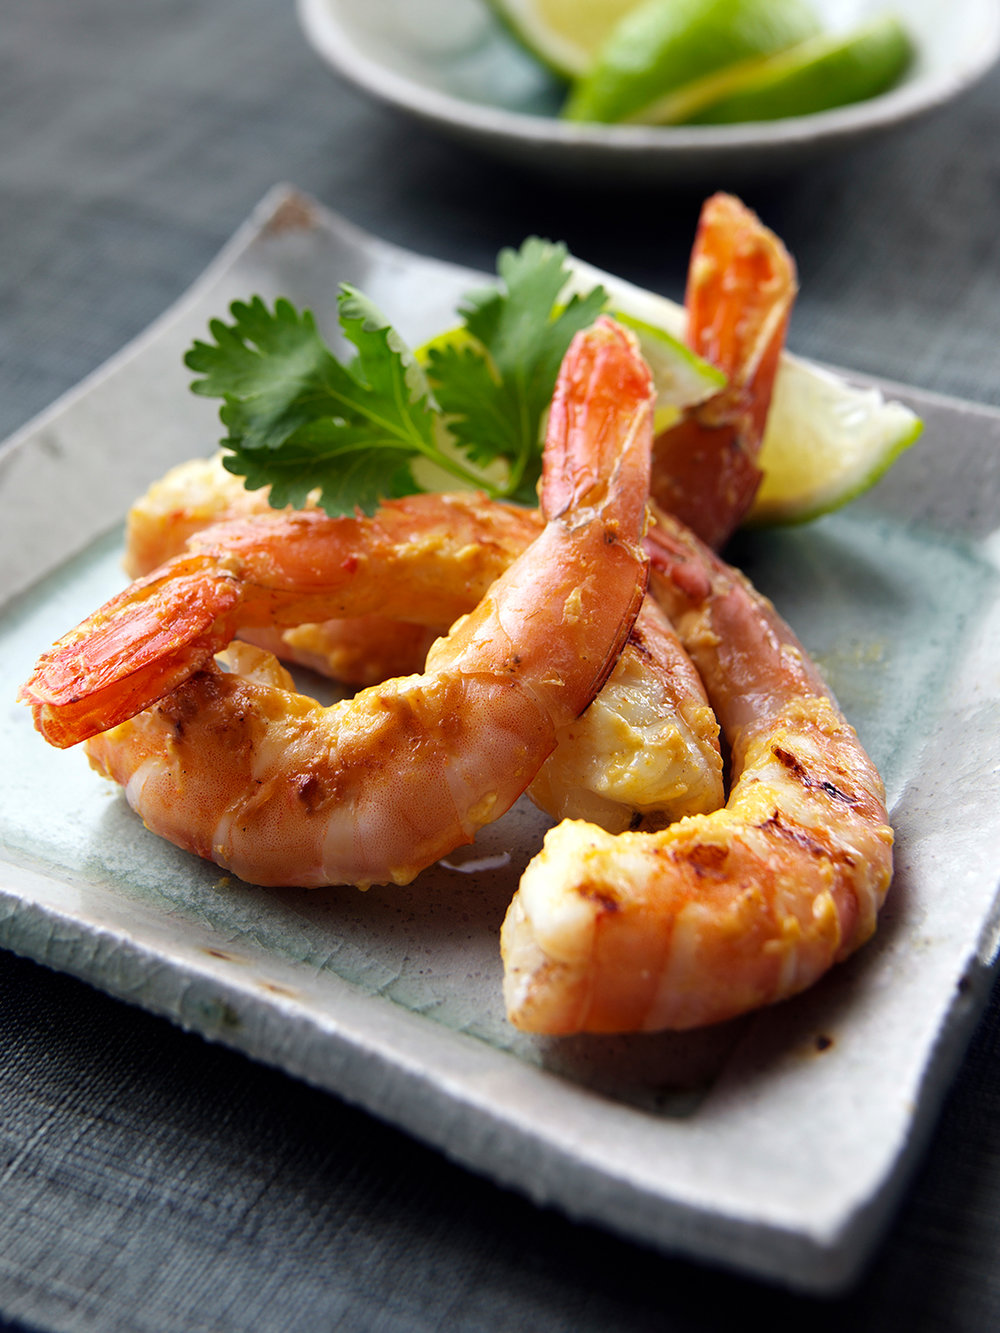 Curried prawns aka shrimps